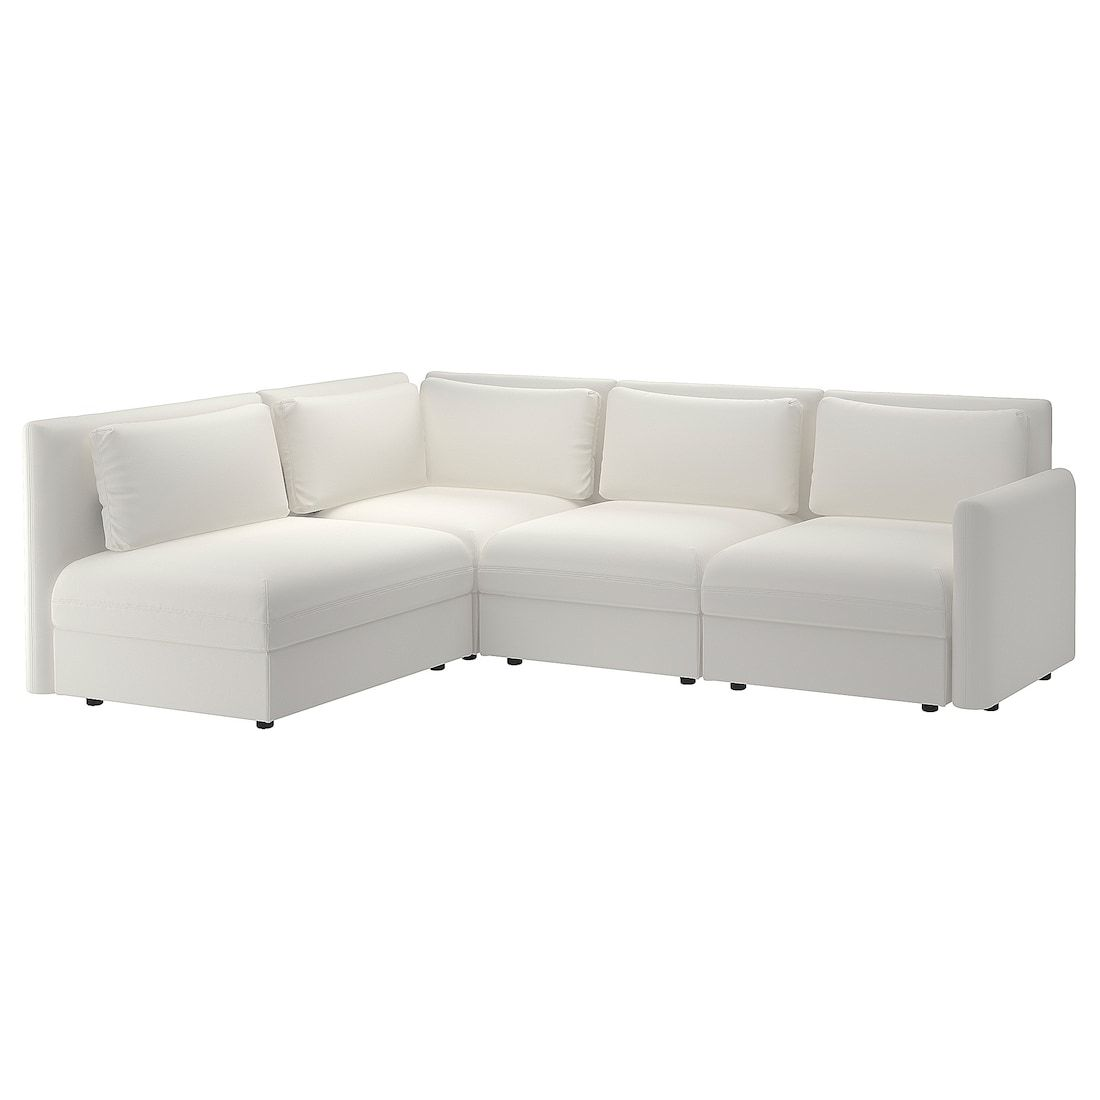 Vallentuna Modular Corner Sofa 3 Seat With Storage Murum White Modular Corner Sofa Corner Sofa Modular Sectional Sofa